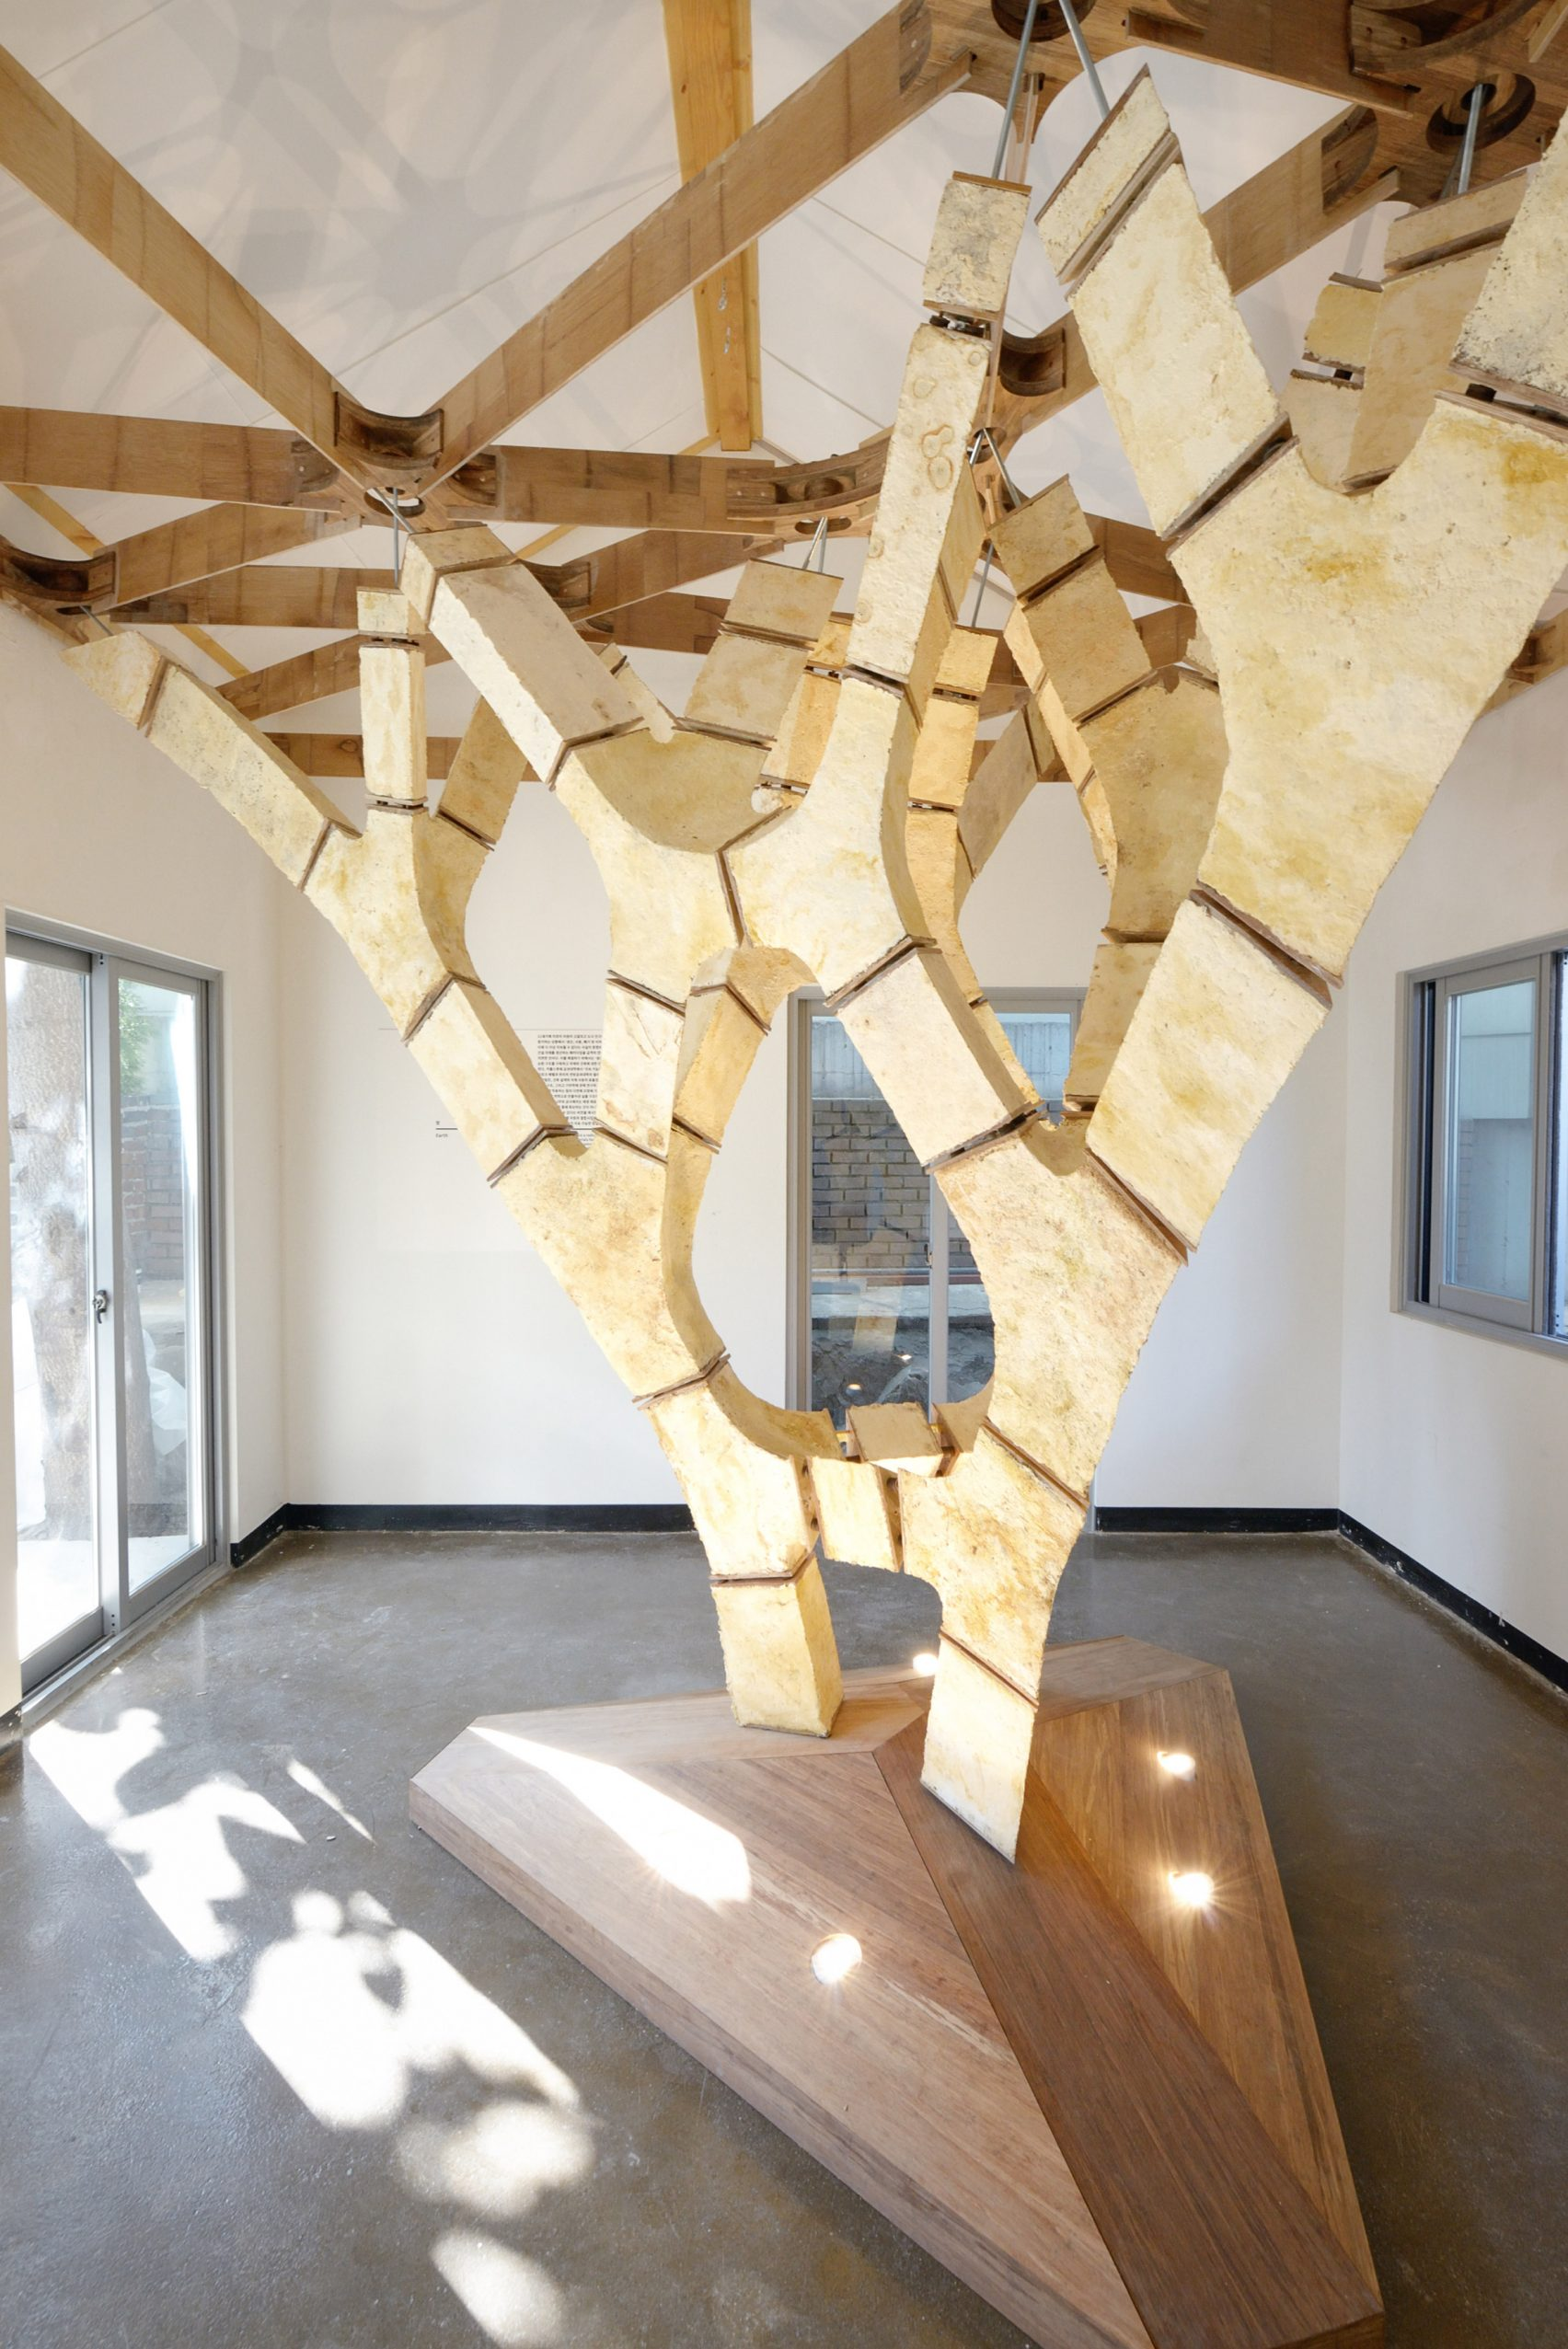 mycellium seoul biennale architecture dezeen 2364 col 3 2 1704x2553